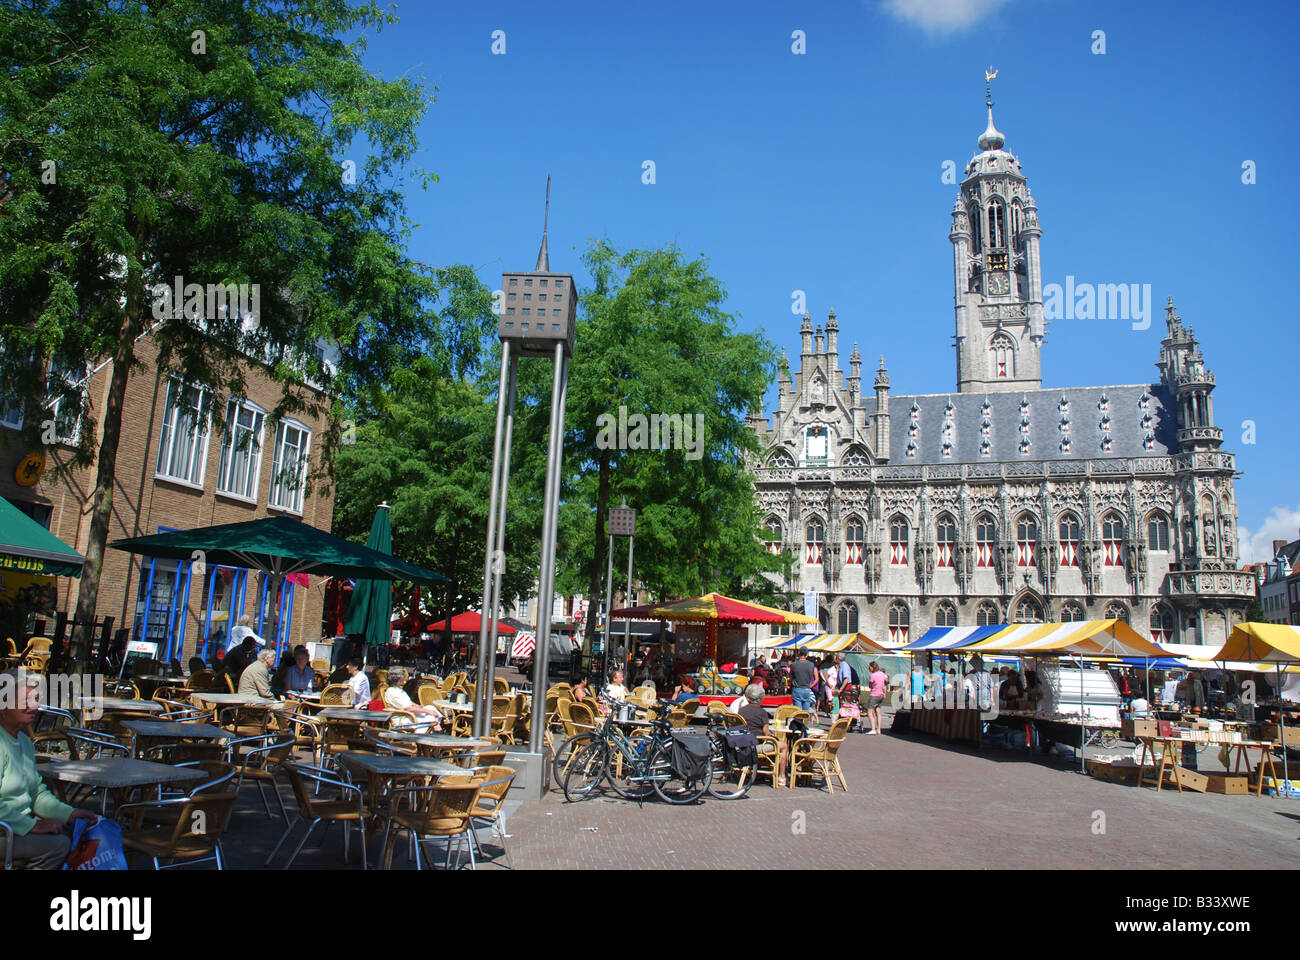 town hall and Market Square Middelburg Zeeland Netherlands Stock Photo